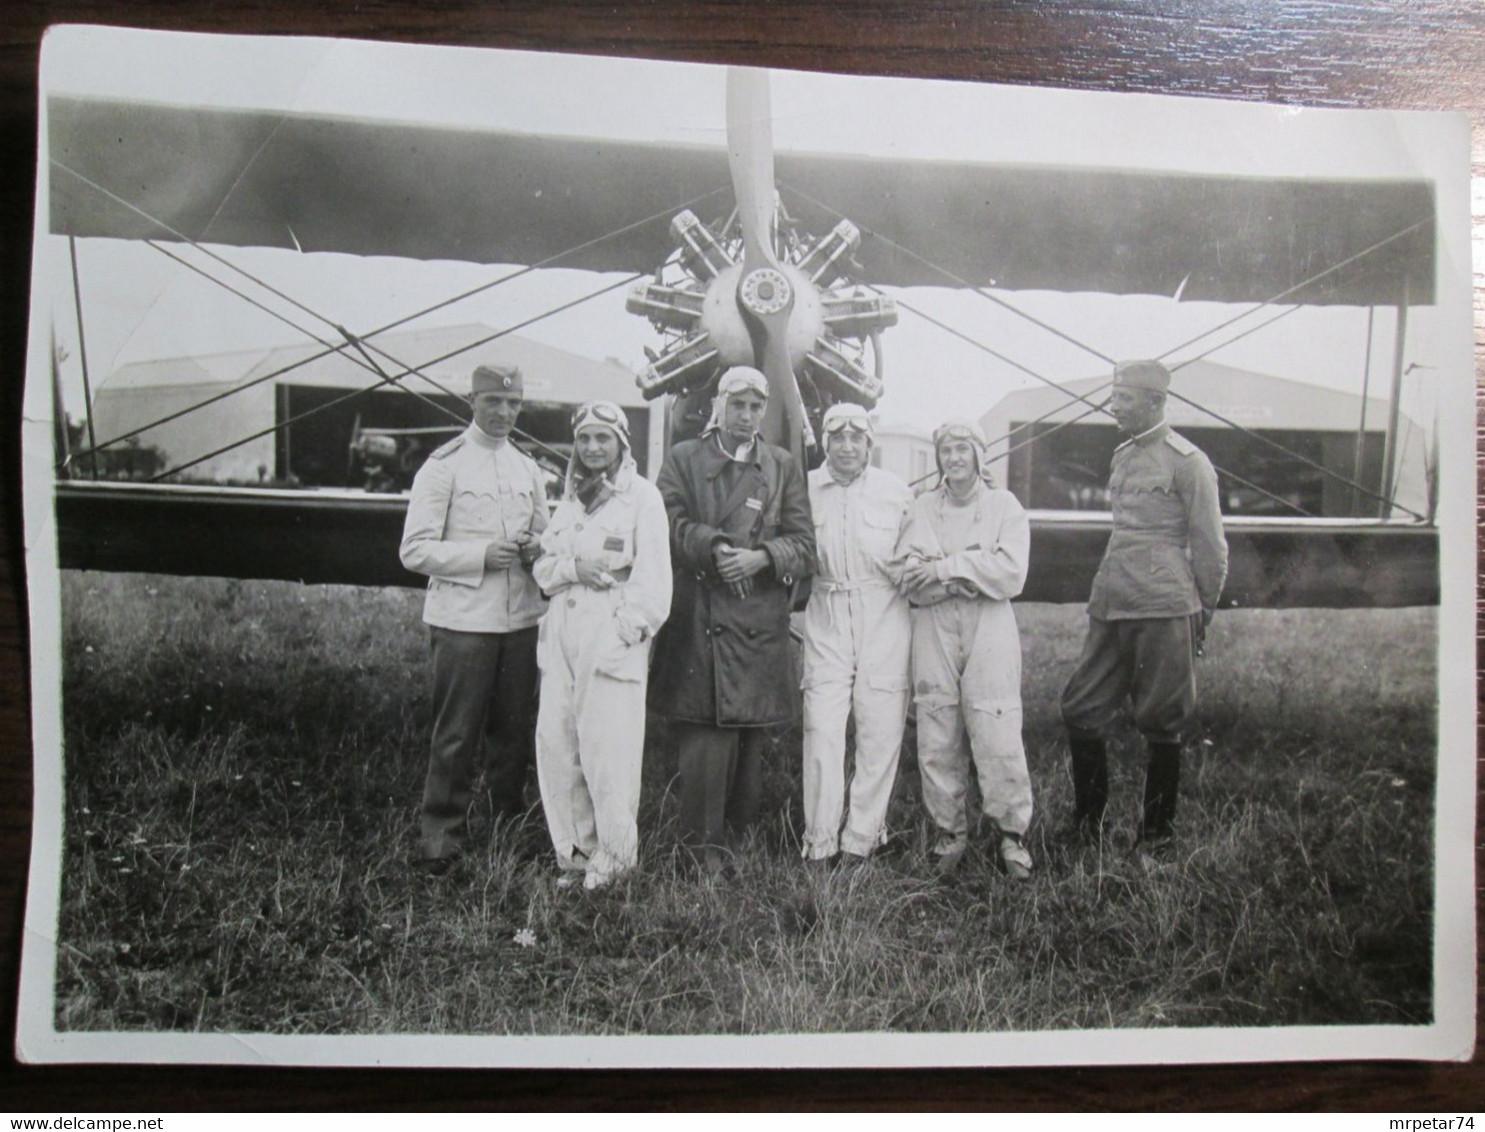 Royal Yugoslavia Air Force Hunter Escadrille Novi Sad Serbia 1933. - Anonyme Personen